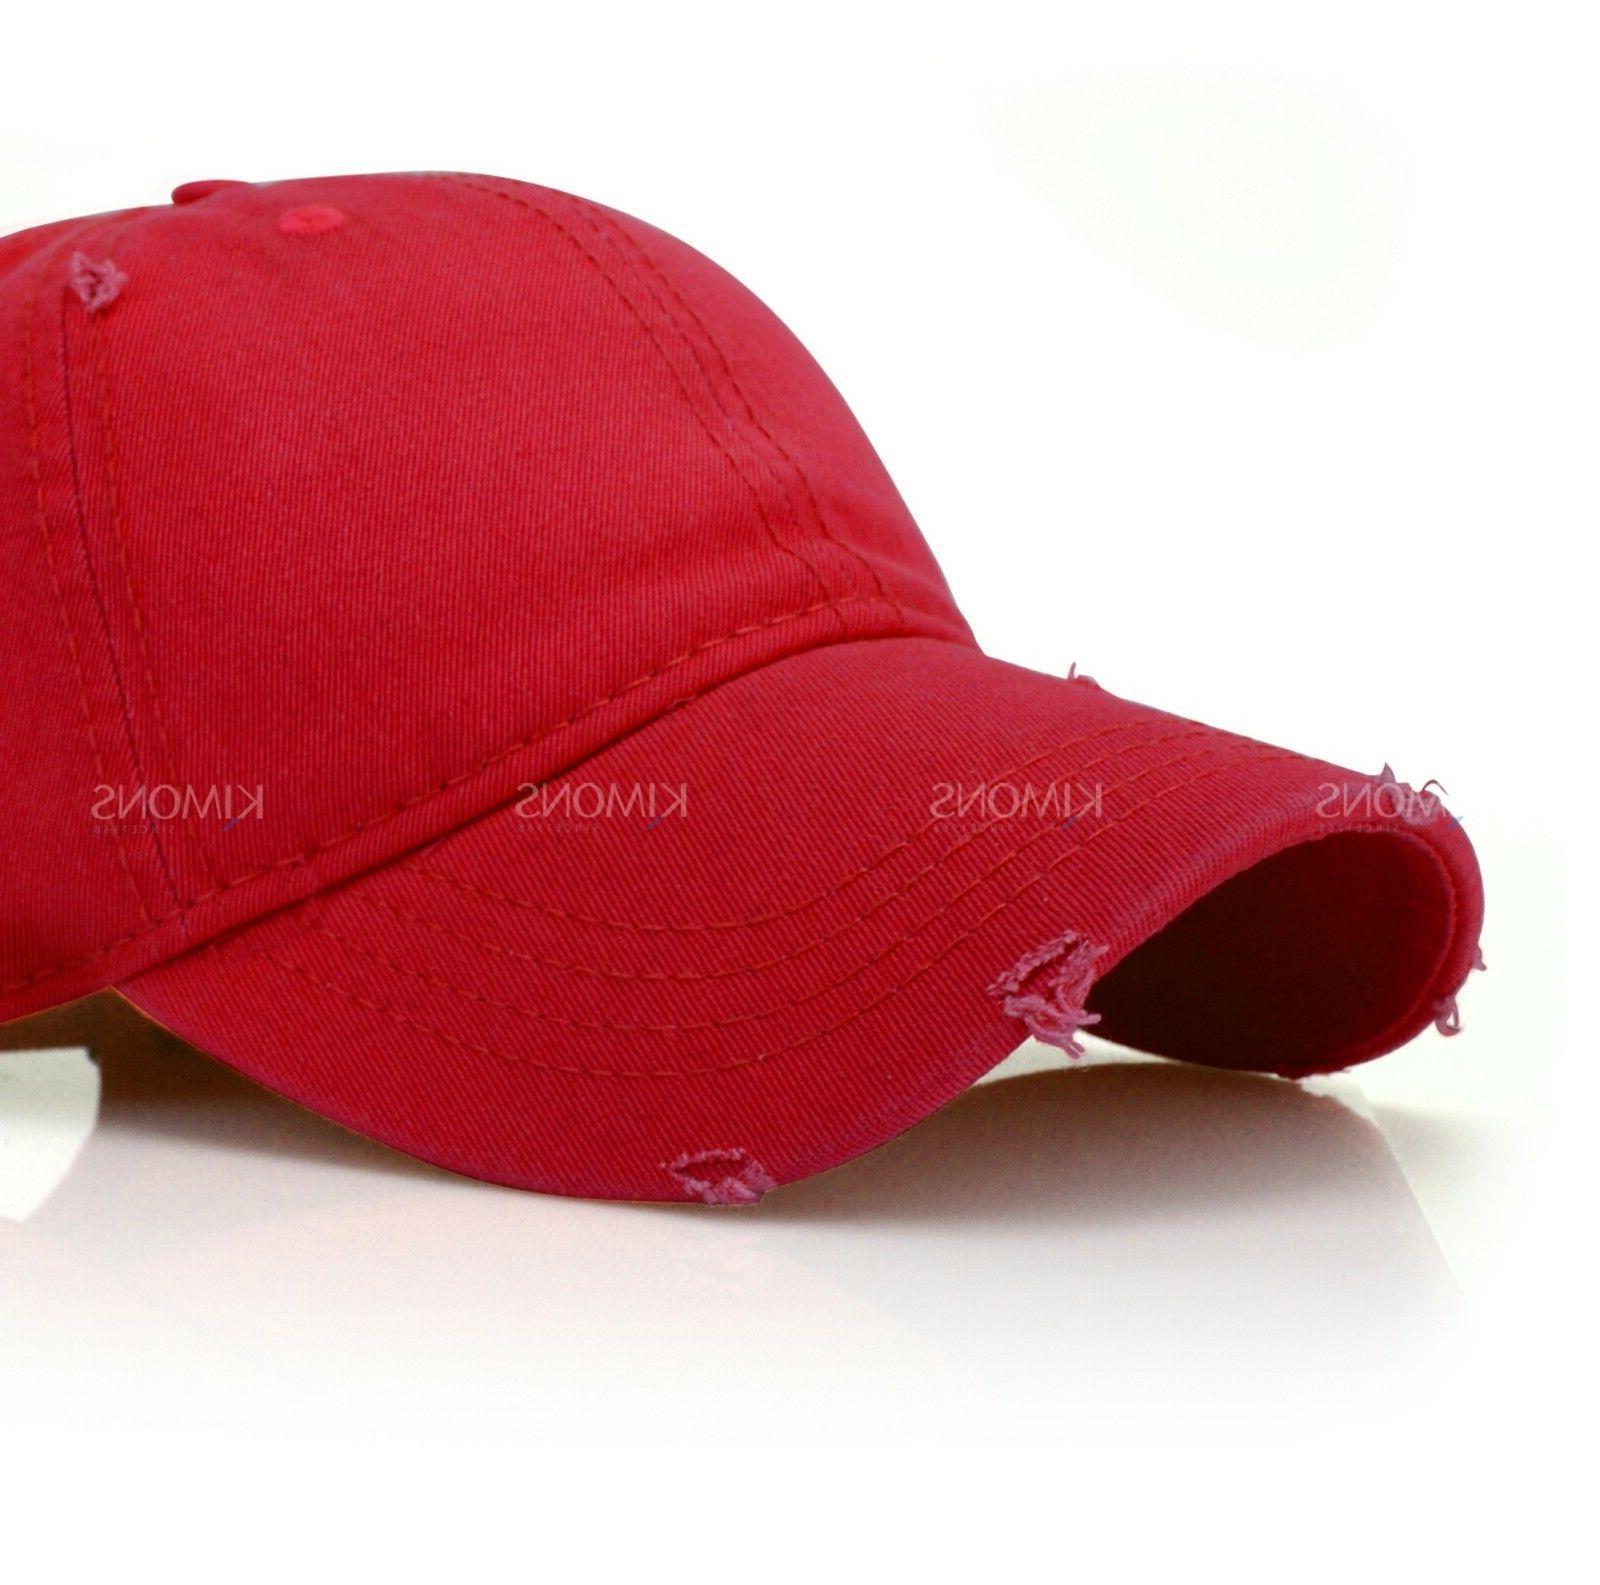 Distressed Cotton Baseball Cap Solid Blank Women